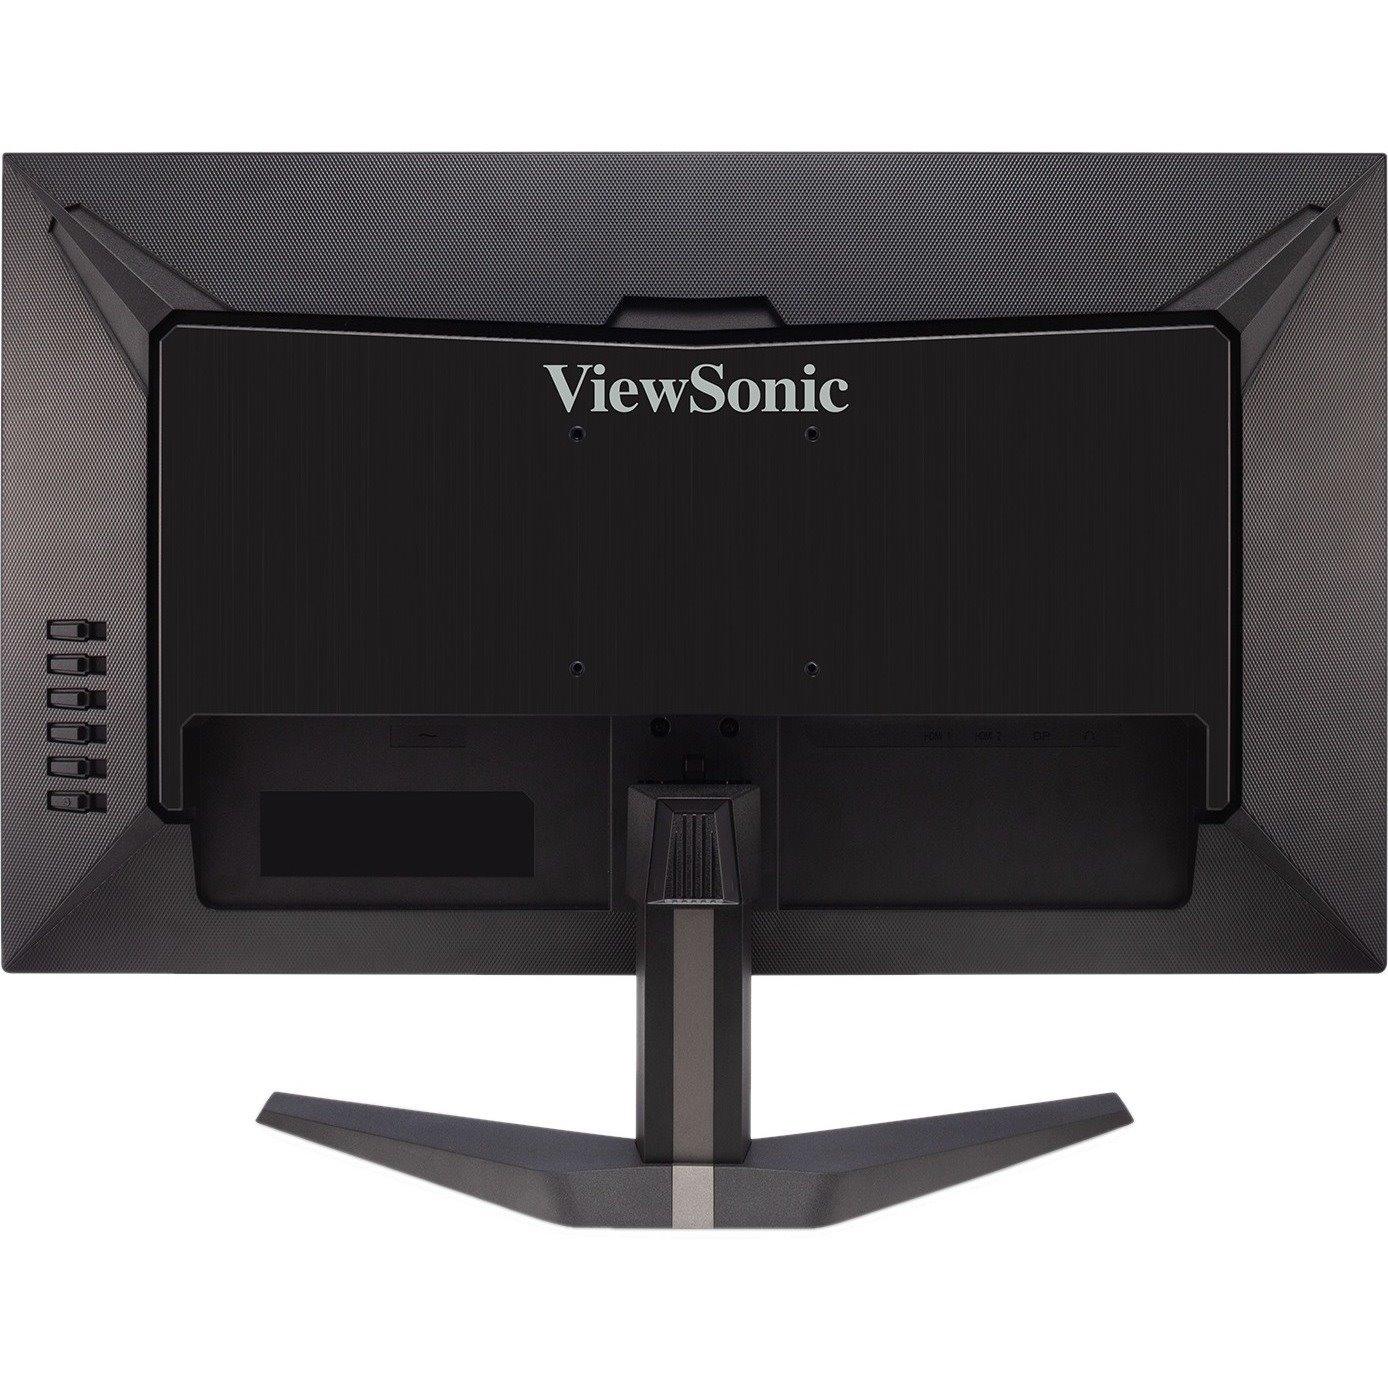 "Viewsonic VX2758-2KP-MHD 68.6 cm (27"") WQHD LED Gaming LCD Monitor - 16:9"